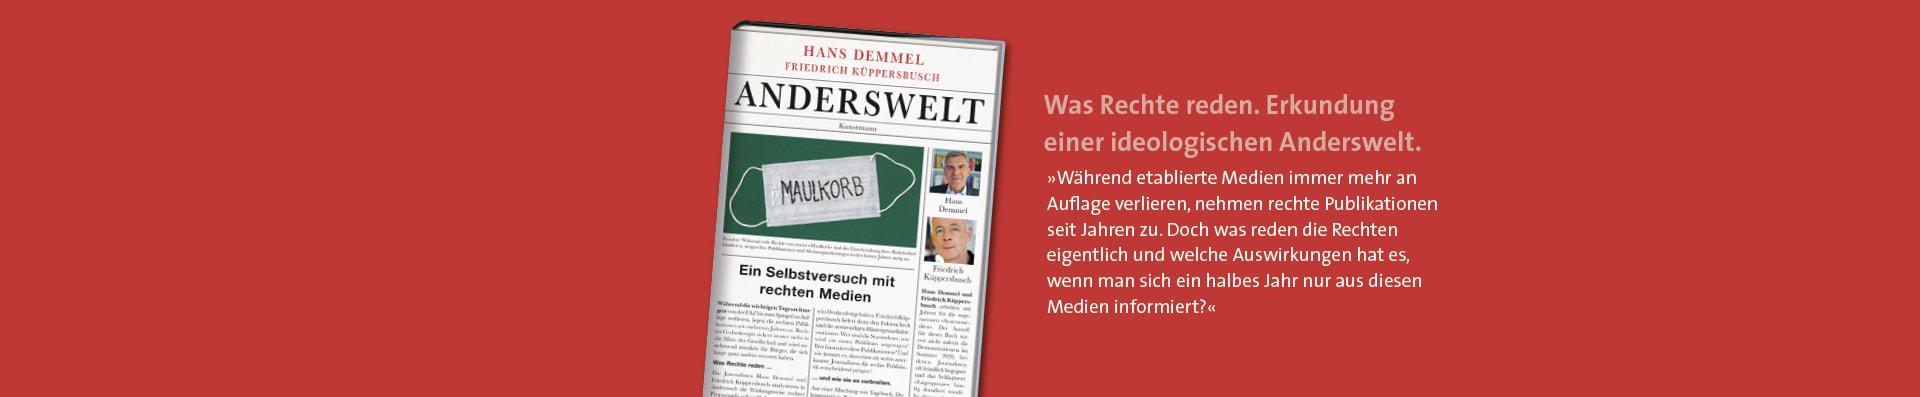 Hans Demmel / Friedrich Küppersbusch – Anderswelt